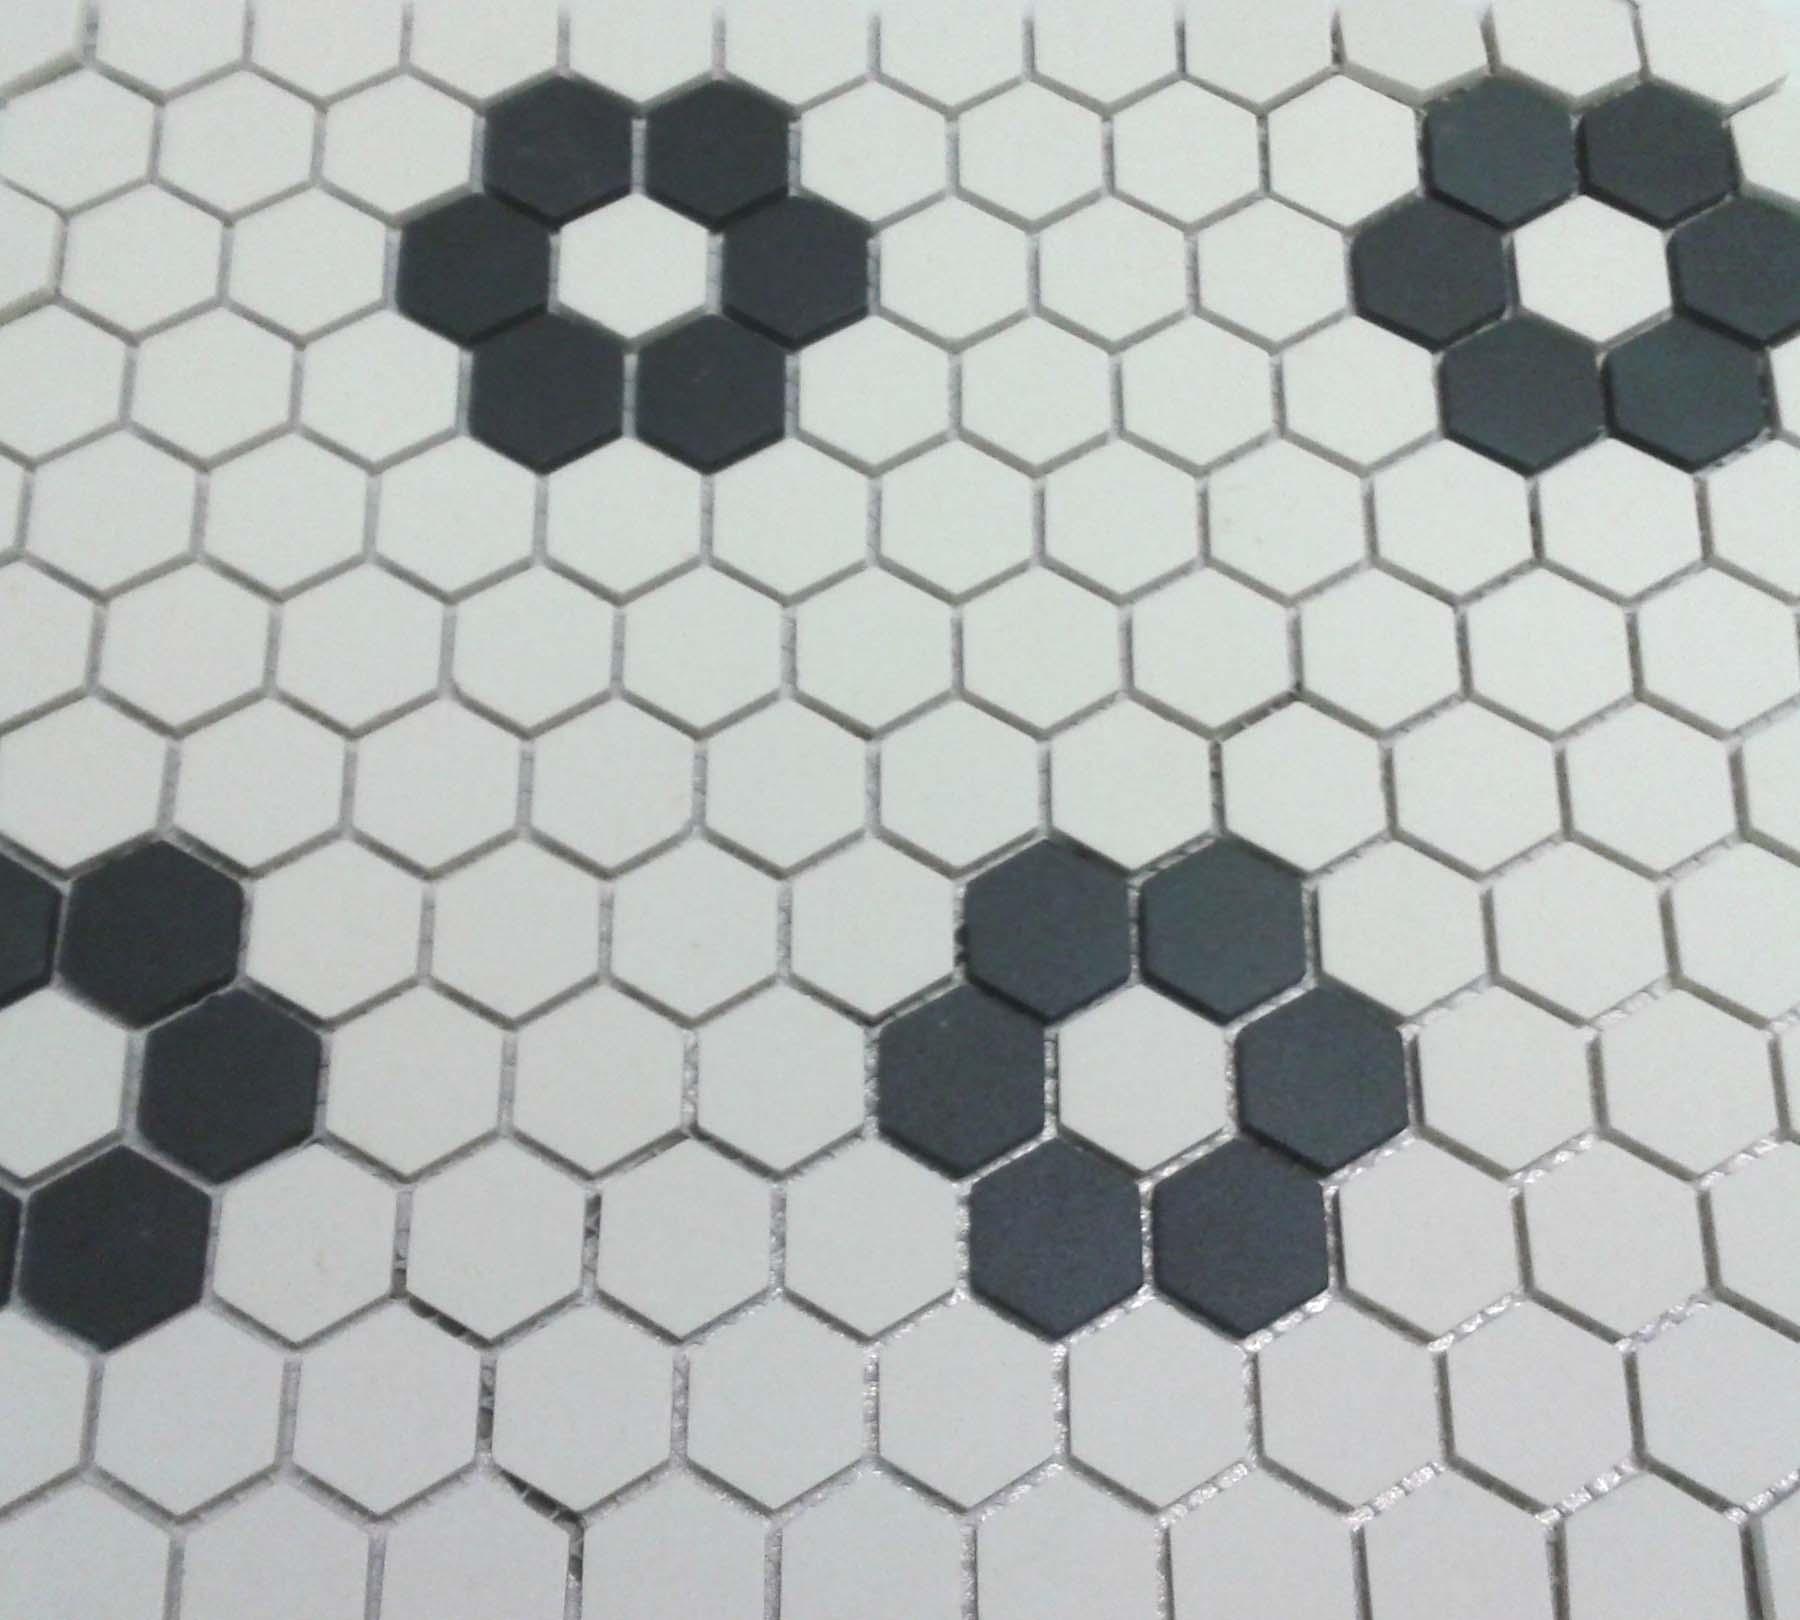 Metro Vintage Matte White Hexagon Porcelain Mosaic 1 Inch Patterned Floor Tiles Patterned Bathroom Tiles Honeycomb Tile Floor